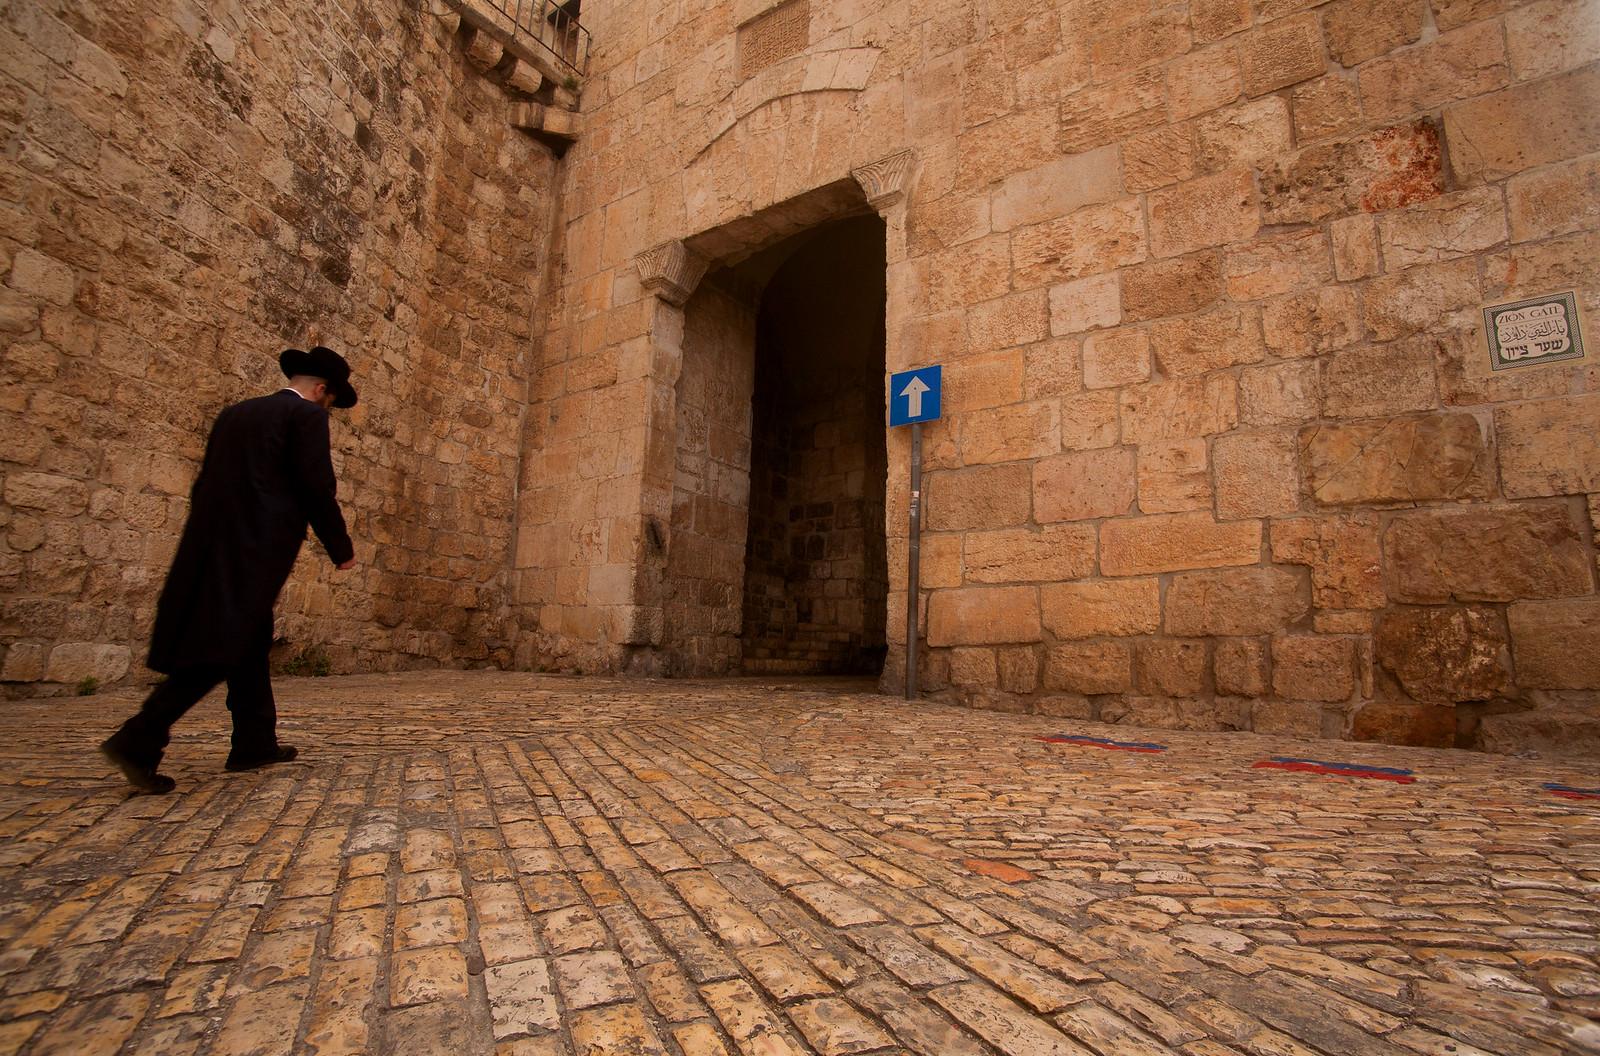 Jerusalem_Old City_Zion Gate_ Sha'ar Tzion_3_Noam Chen_IMOT